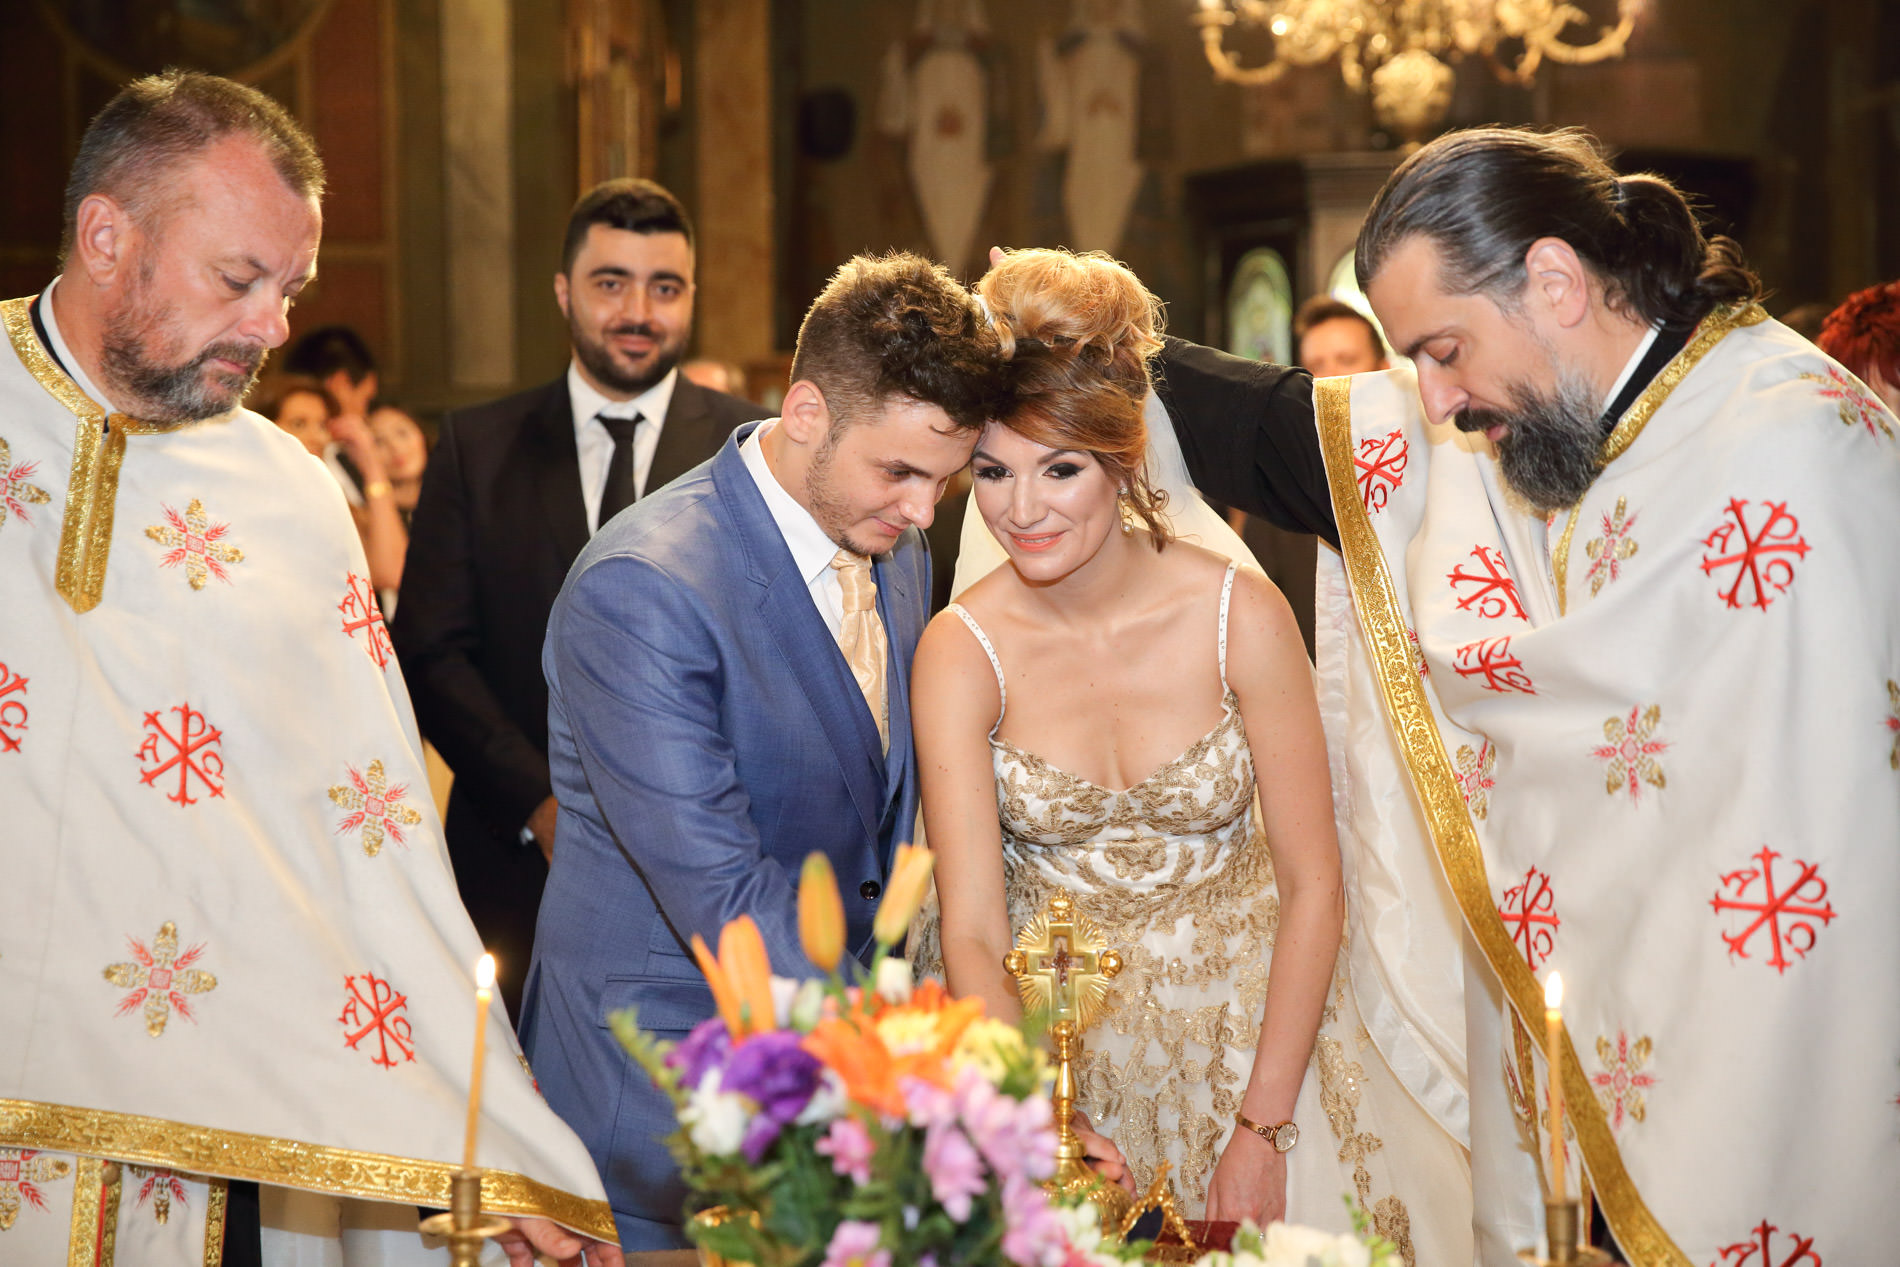 Nunta, foto biserica